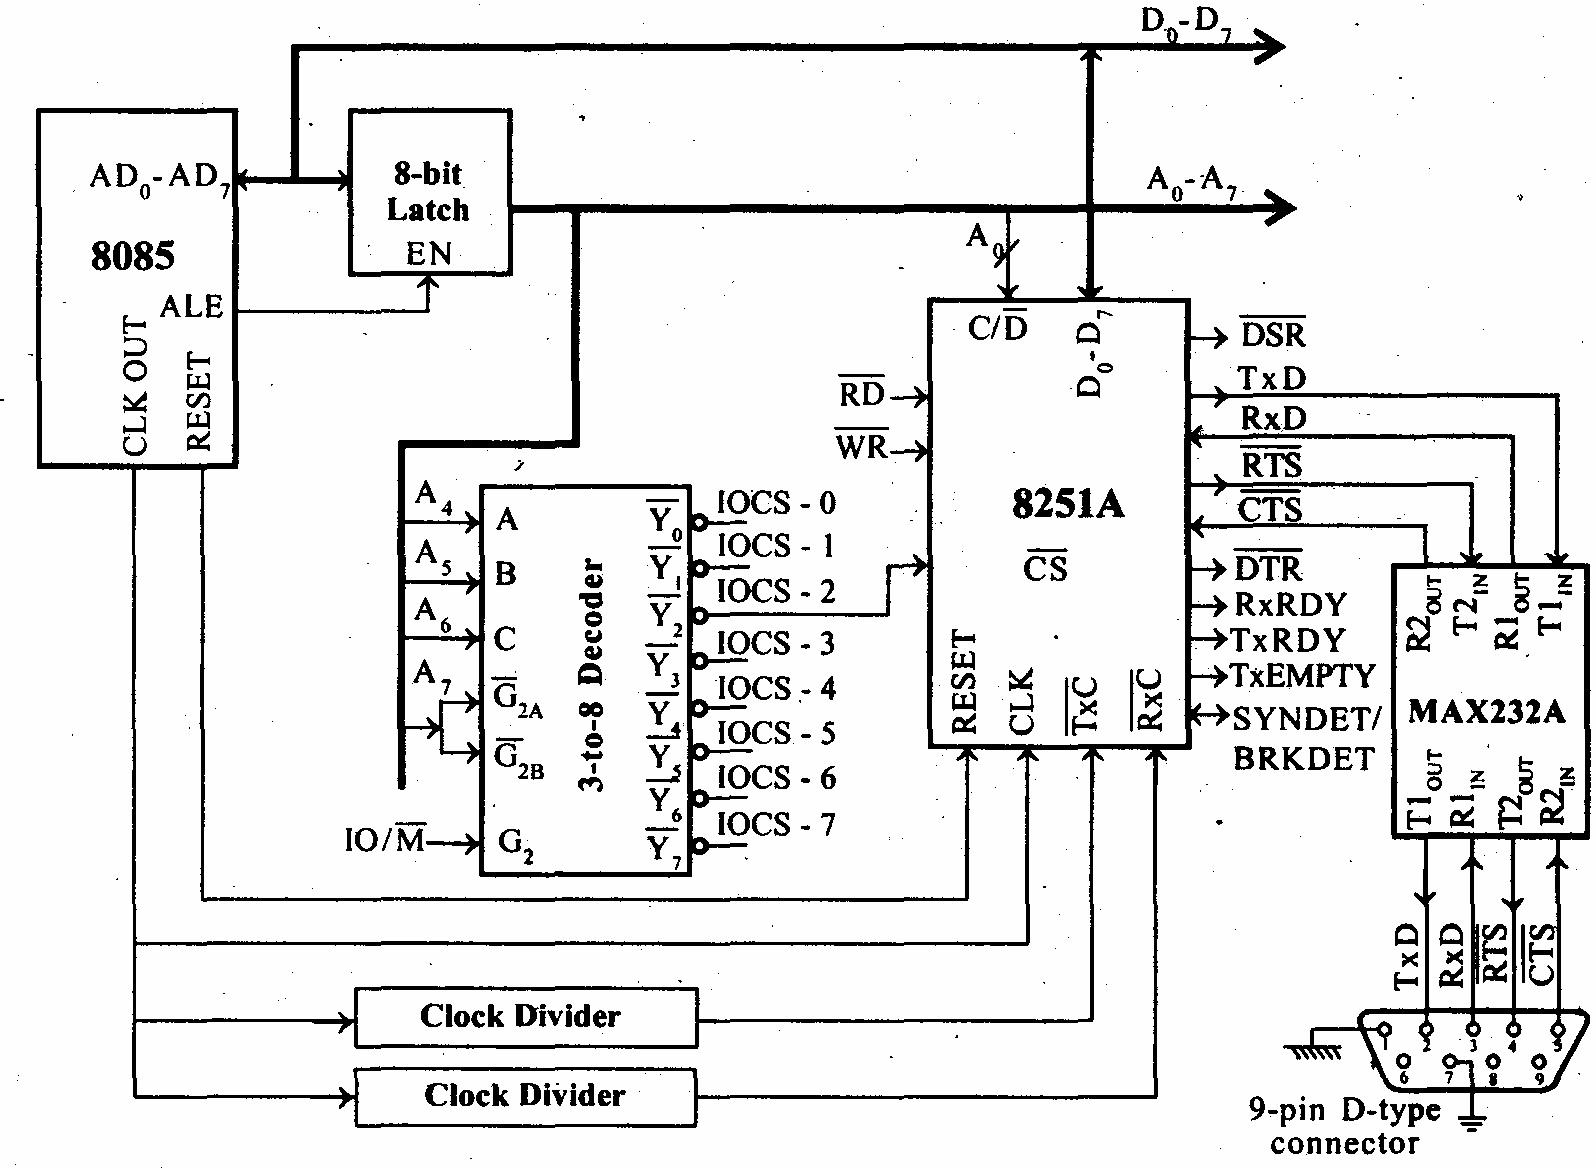 logic diagram of 3 to 8 line decoder [ 1596 x 1168 Pixel ]